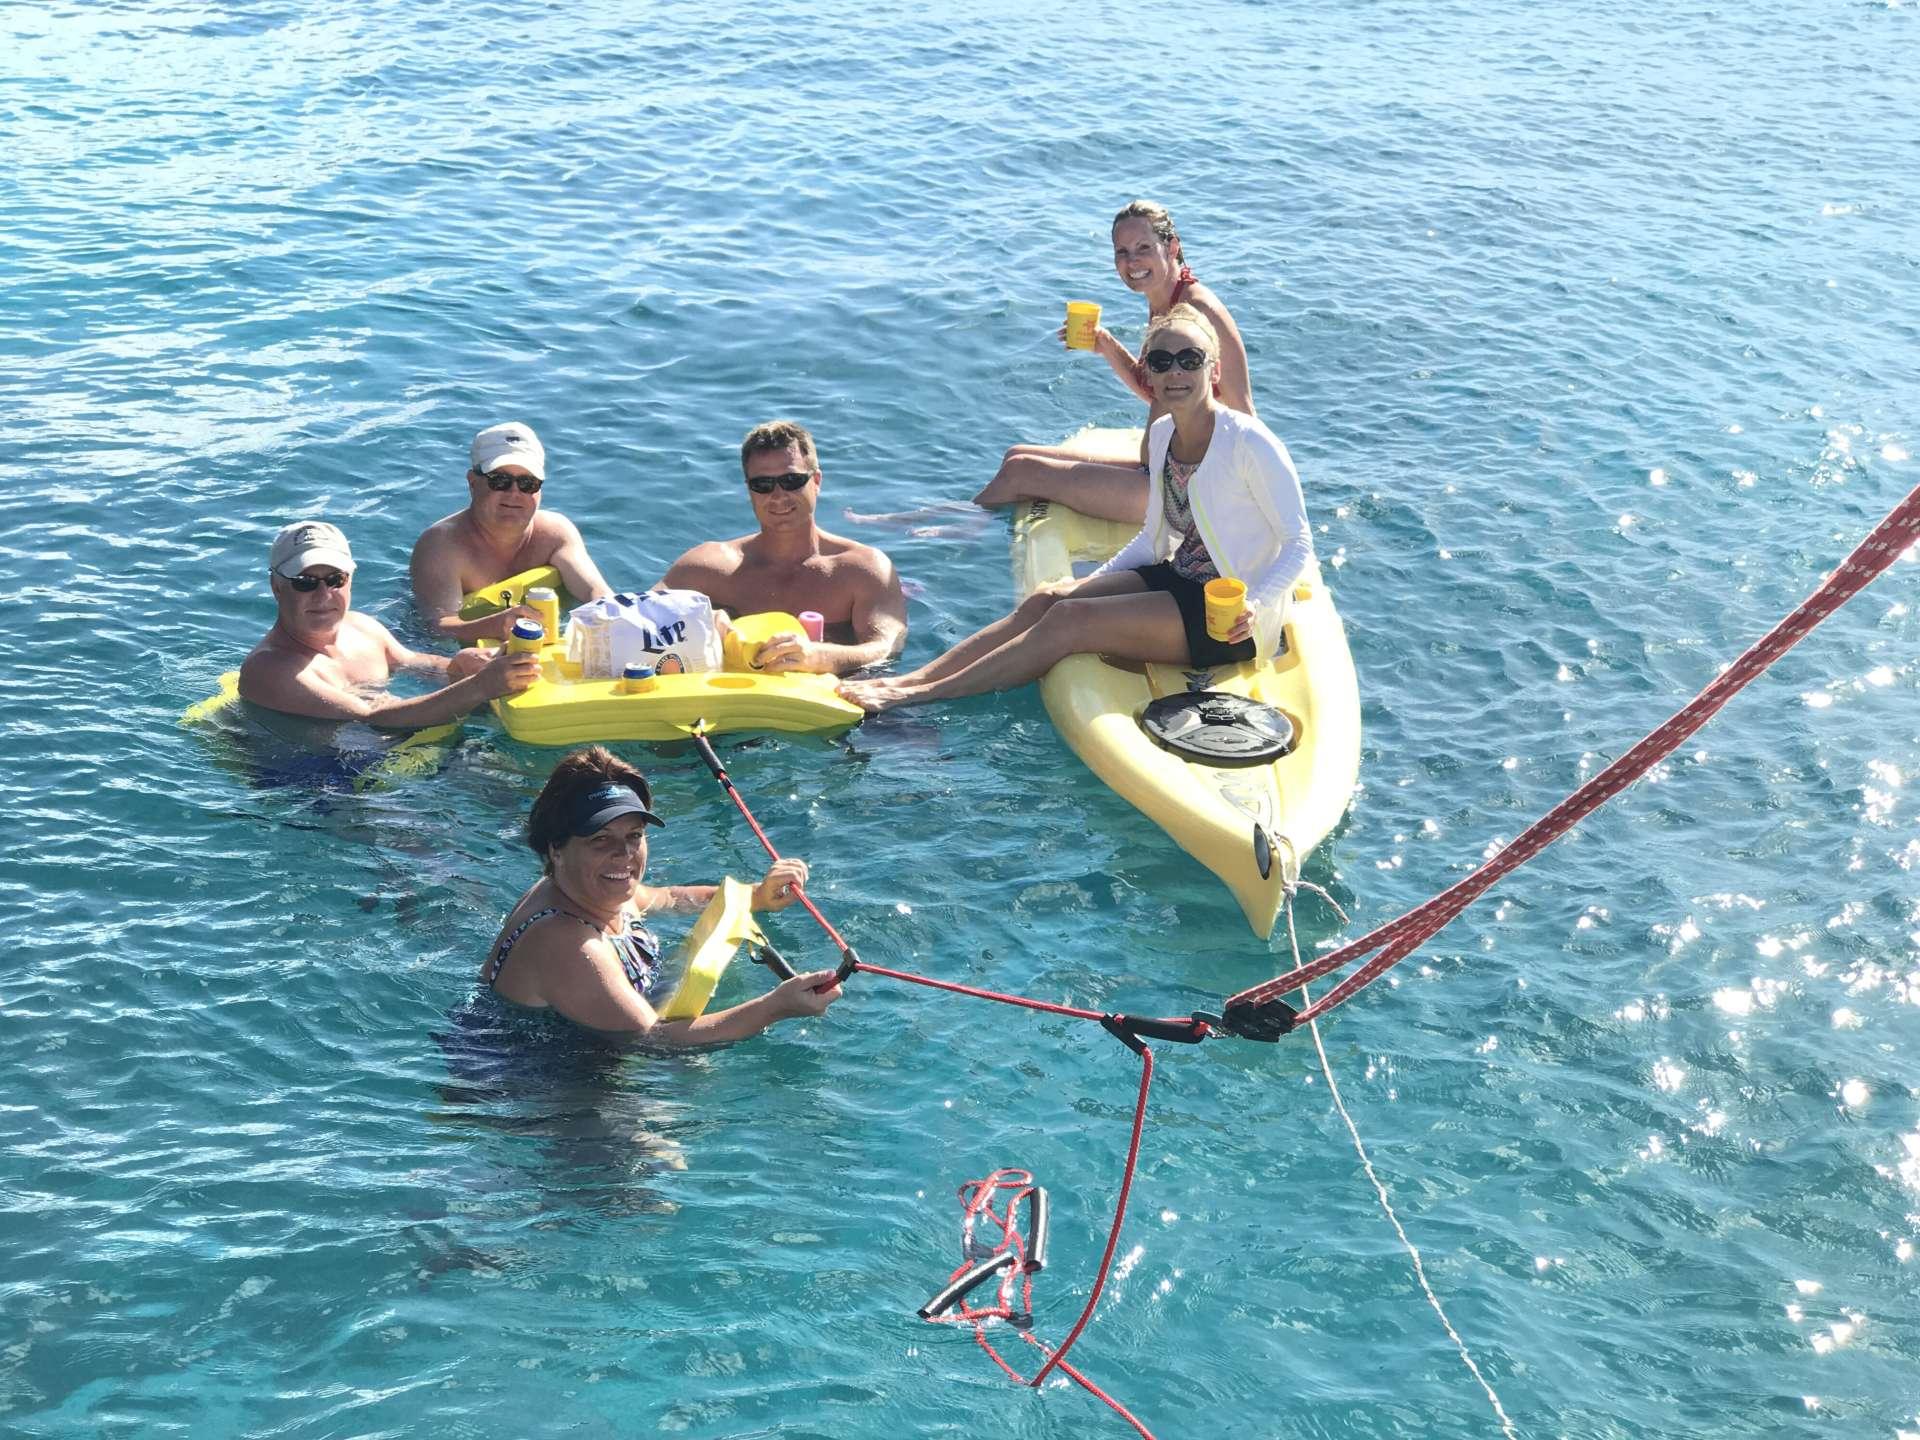 Catamaran Yacht 'STARFISH' Float party!, 6 PAX, 2 Crew, 46.00 Ft, 14.00 Meters, Built 2008, Leopard, Refit Year 2019